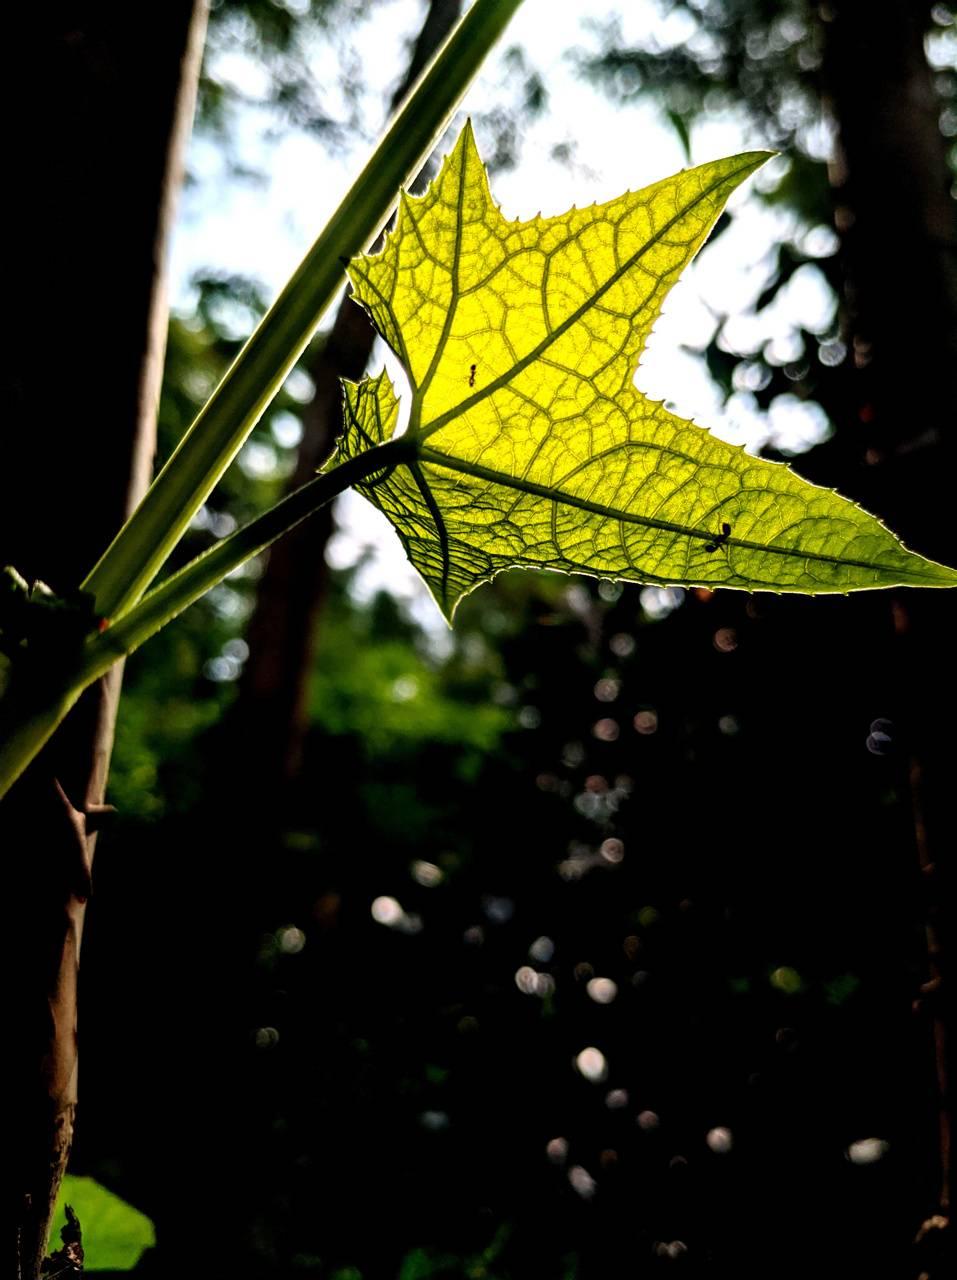 Amoled Leaf